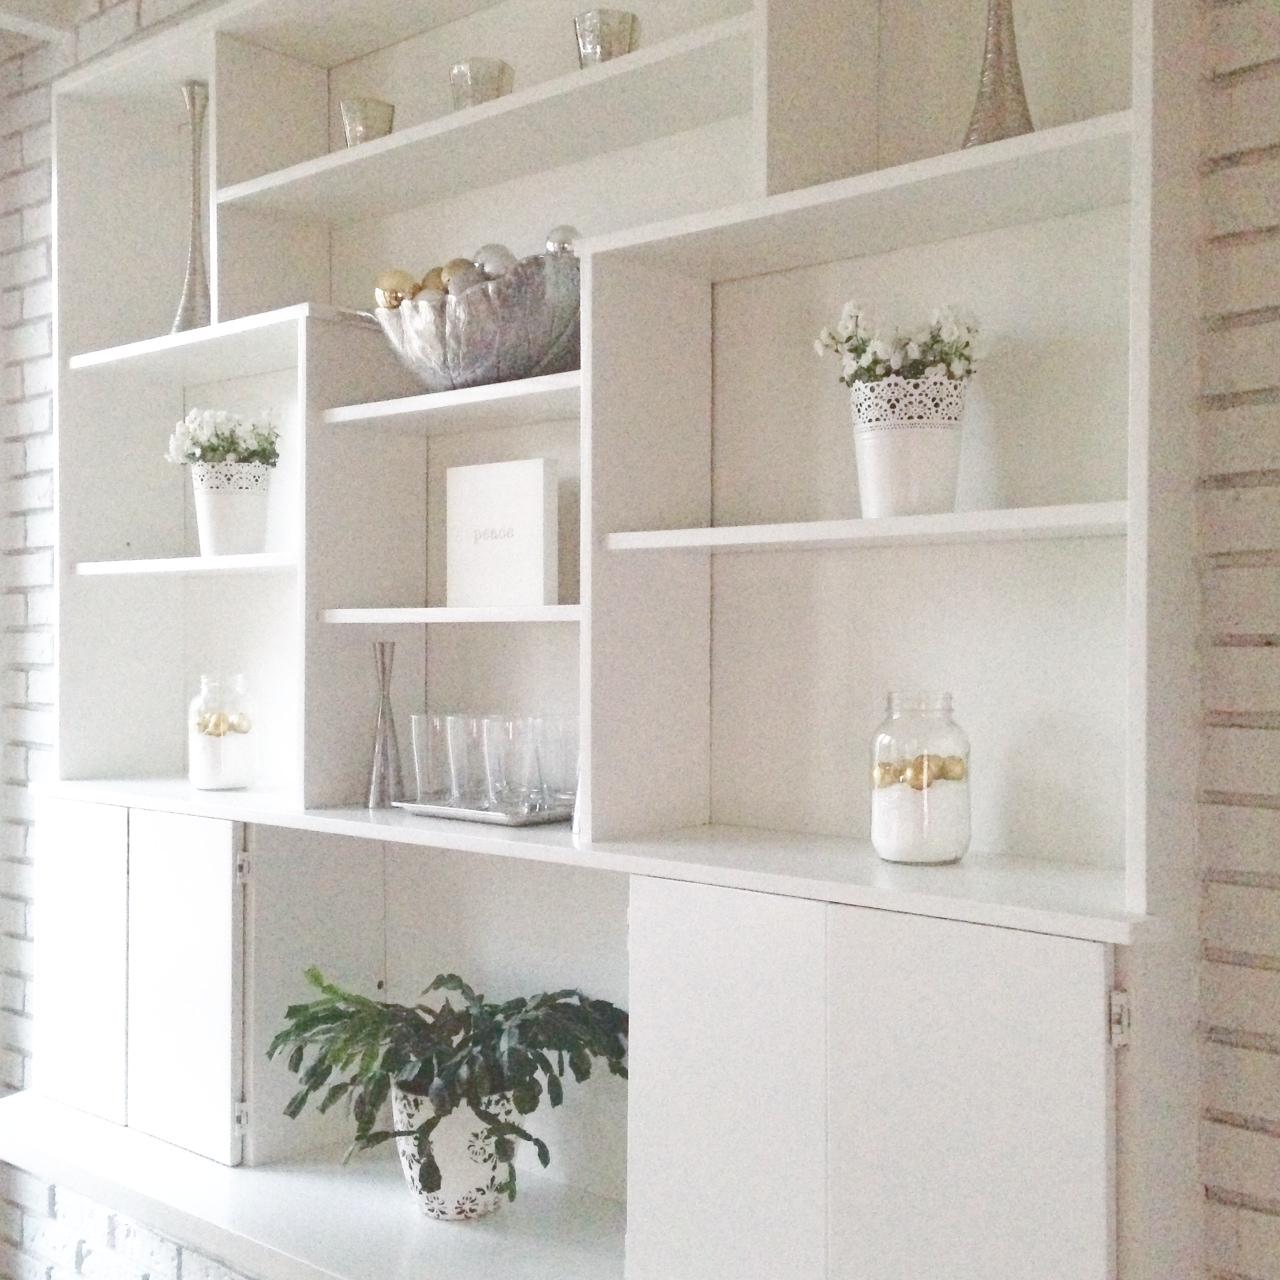 White wall unit